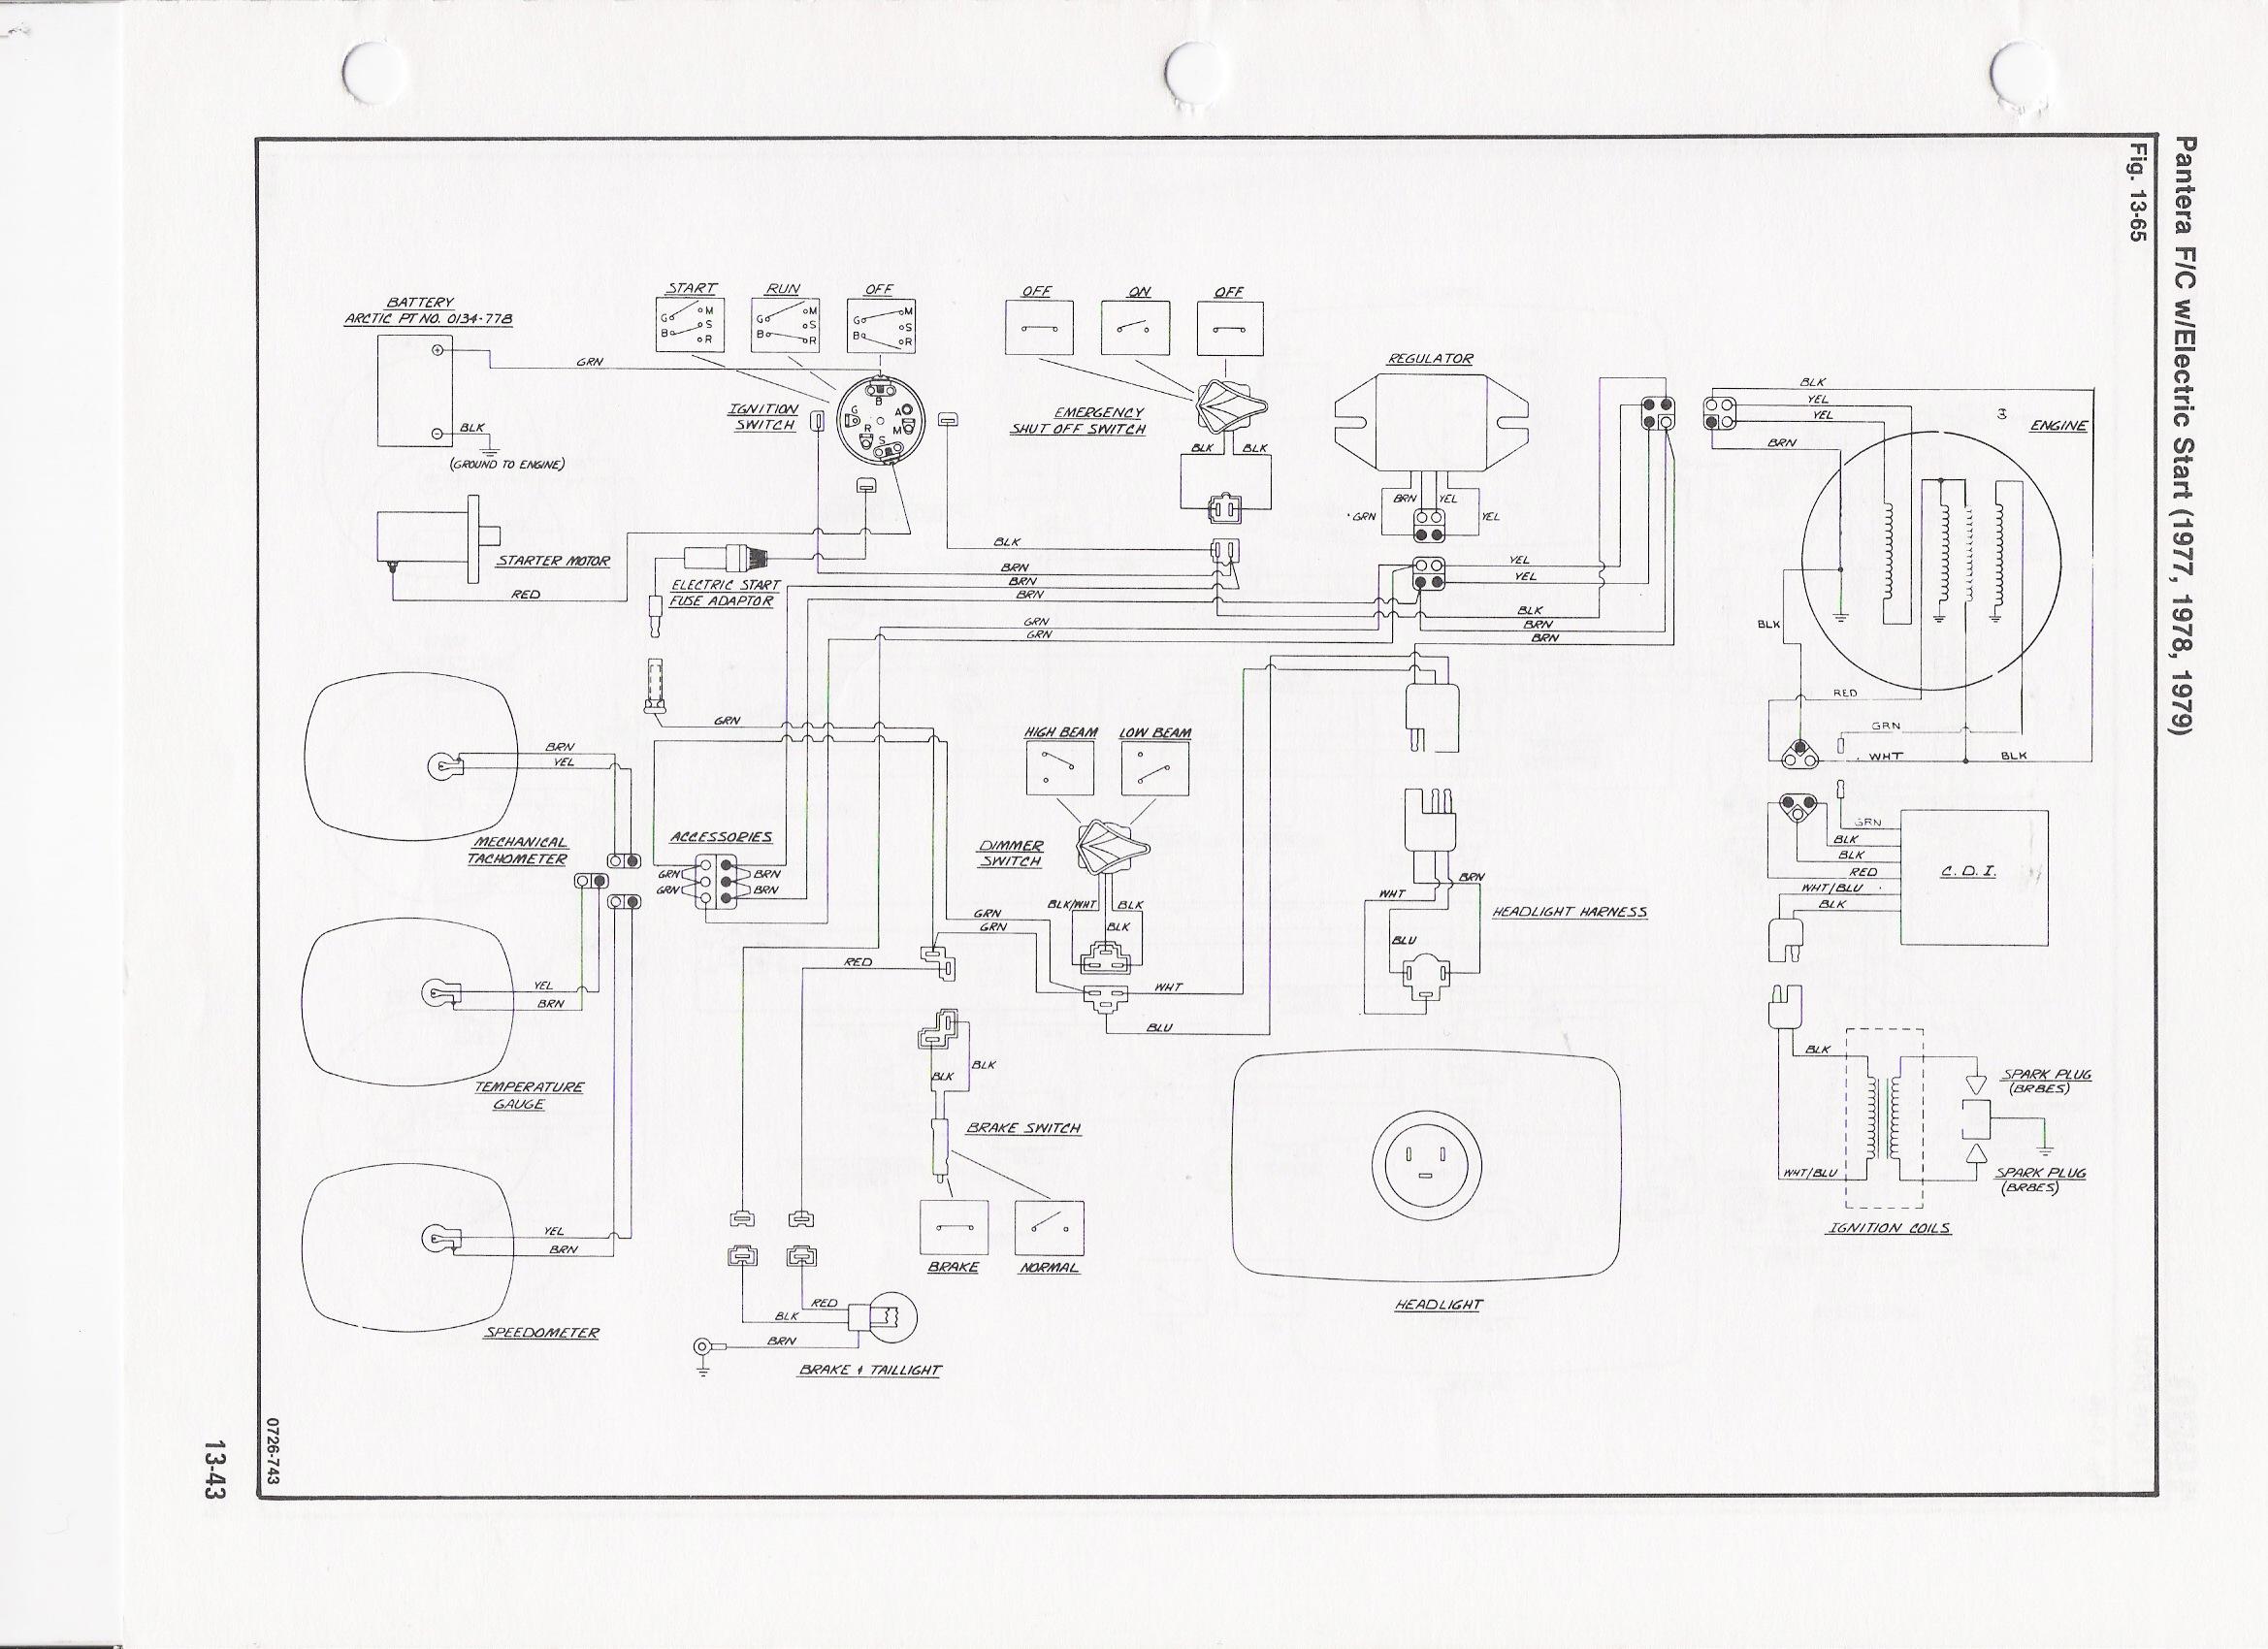 1991 arctic cat jag wiring diagram wiring diagram rh vw4 reise ferienplan de